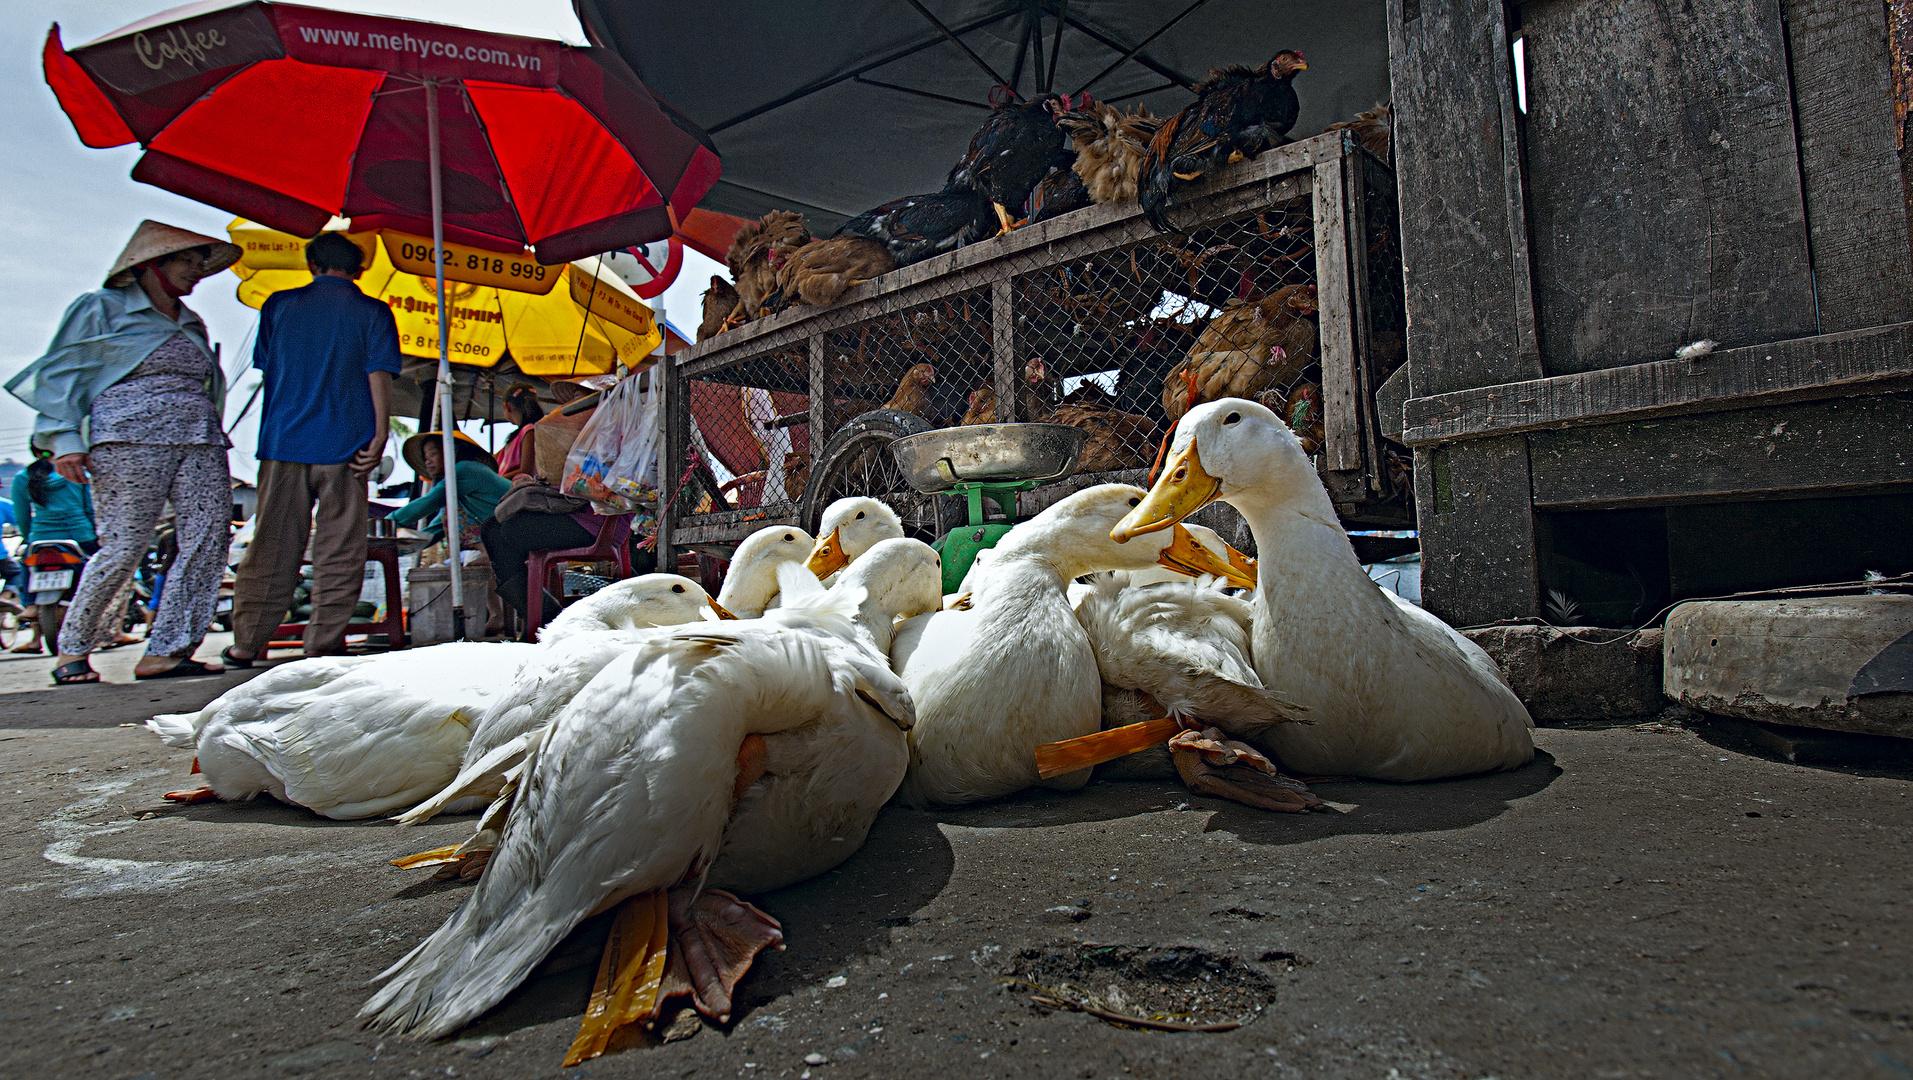 Ducks at the market